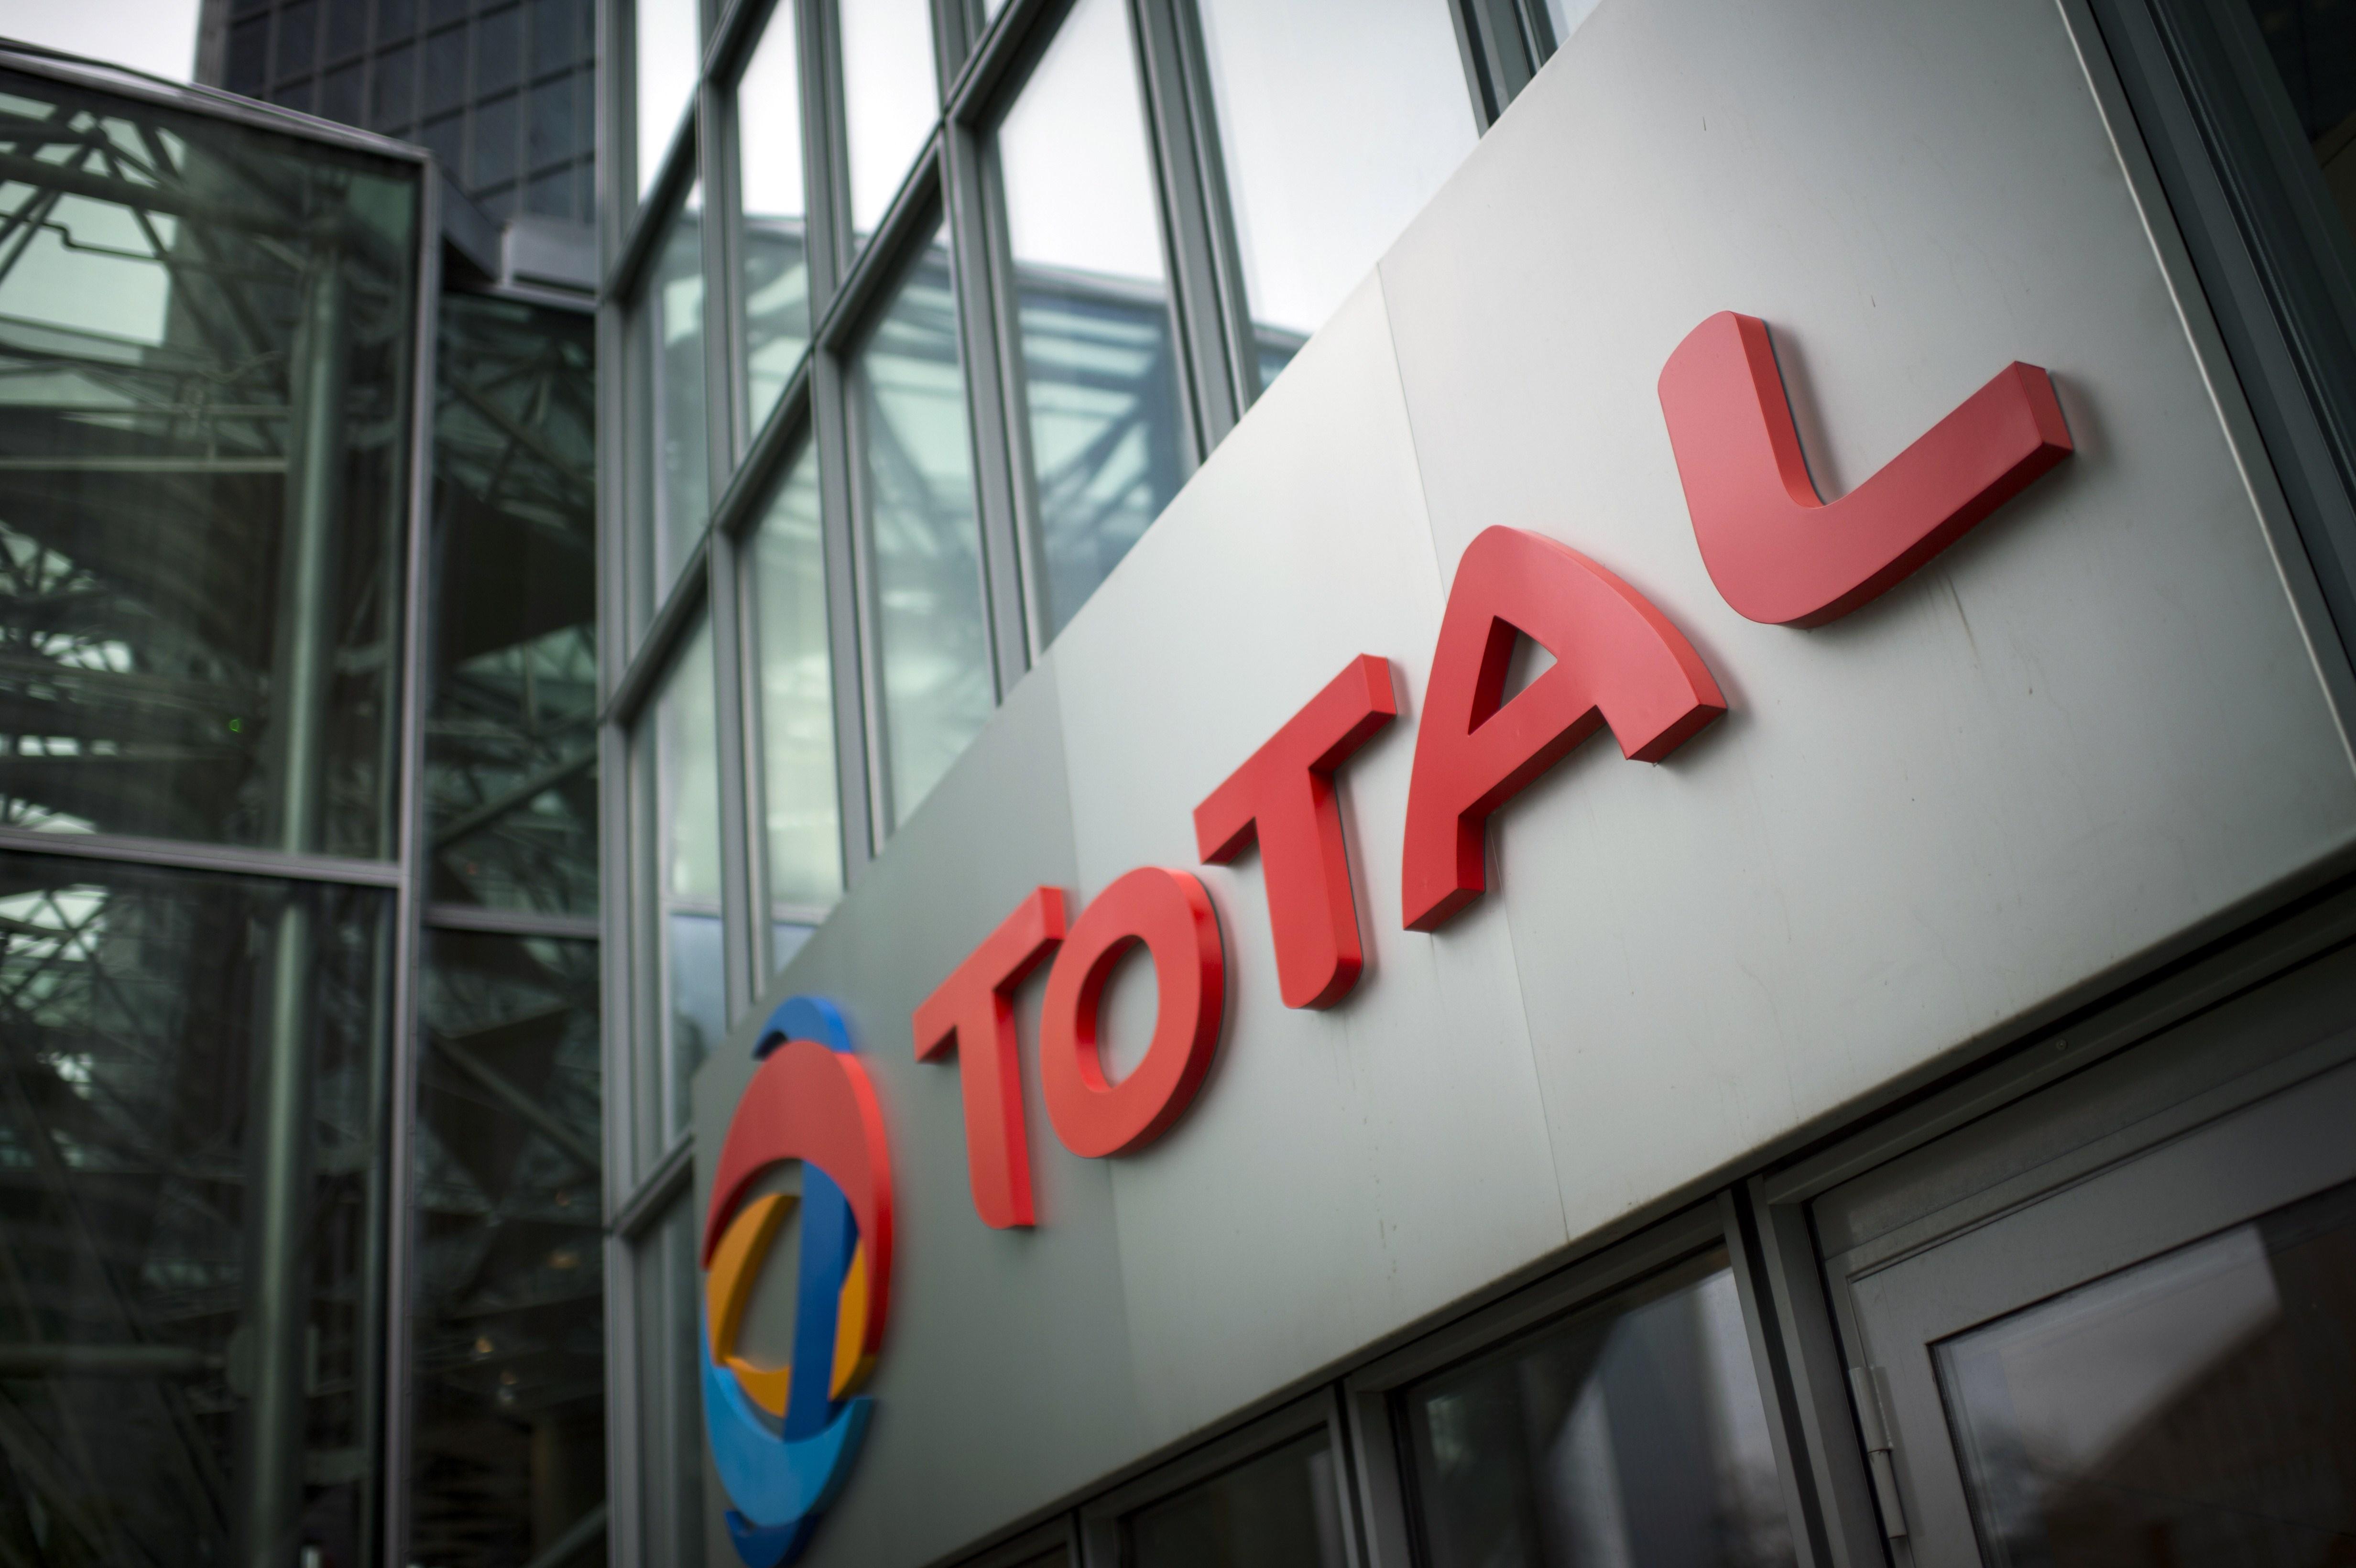 The headquarters of Total,  in La Defense business district, near Paris. (Martin Bureau/AFP/Getty Images)